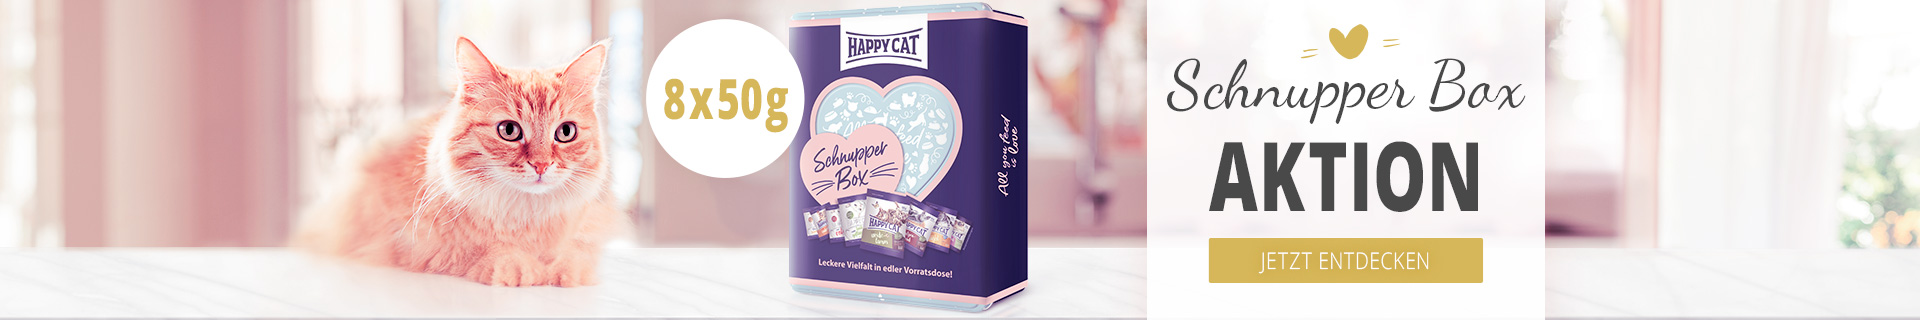 Happy Cat - Schnupperbox